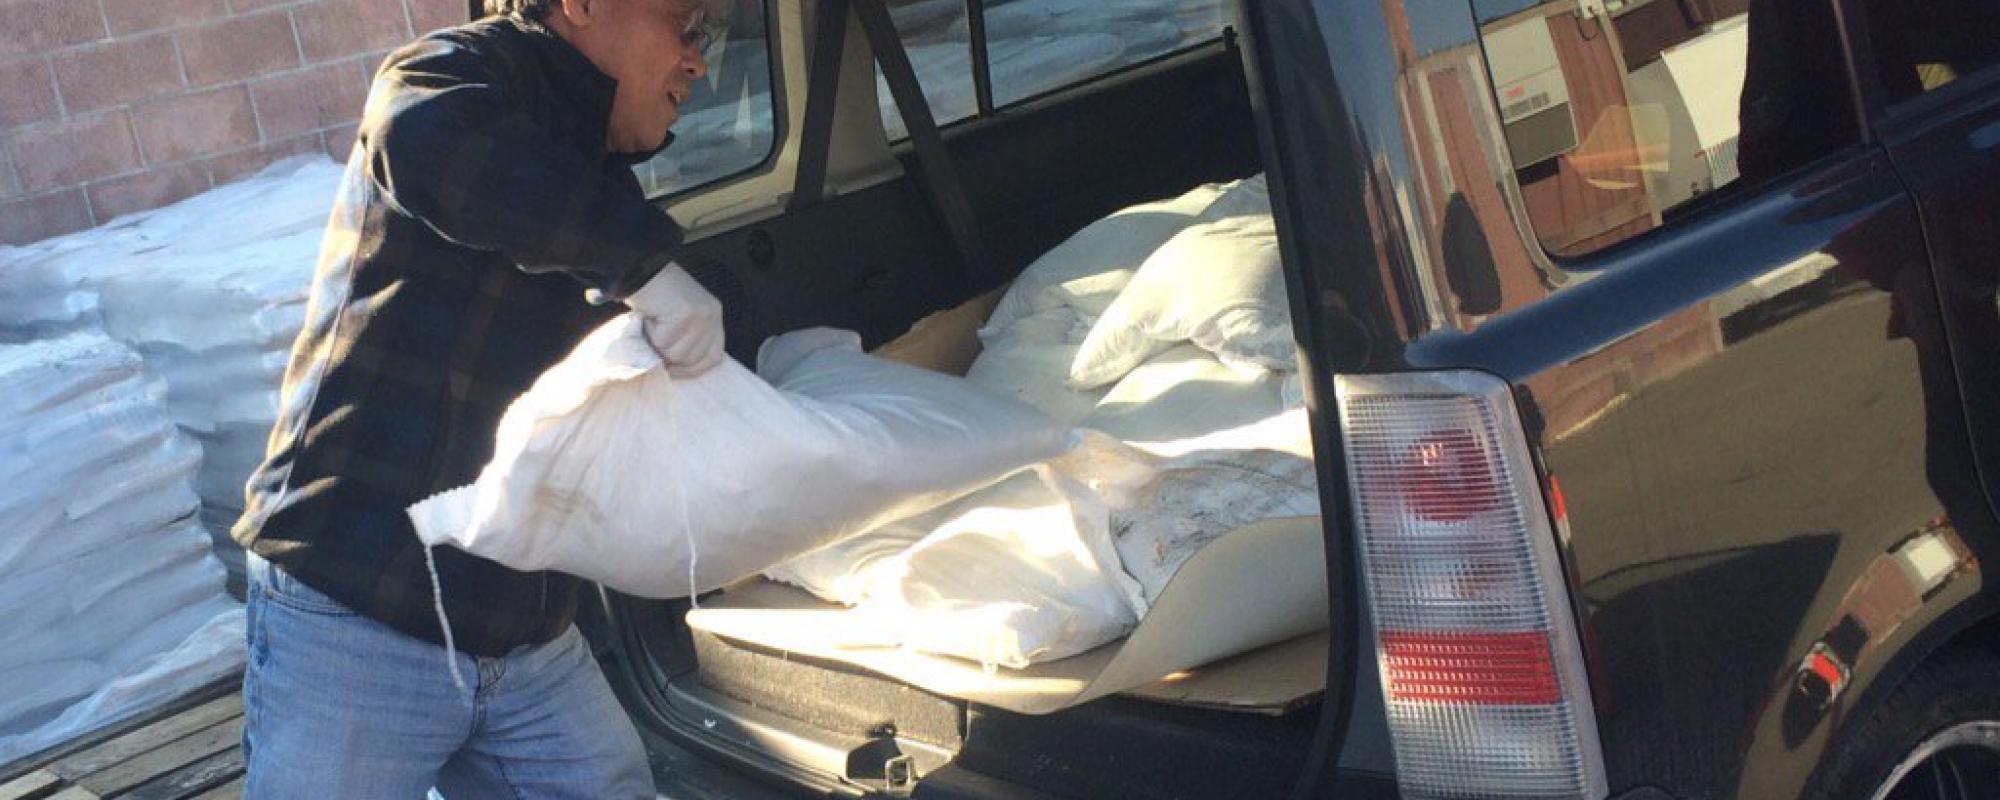 Man loading sandbags into his car